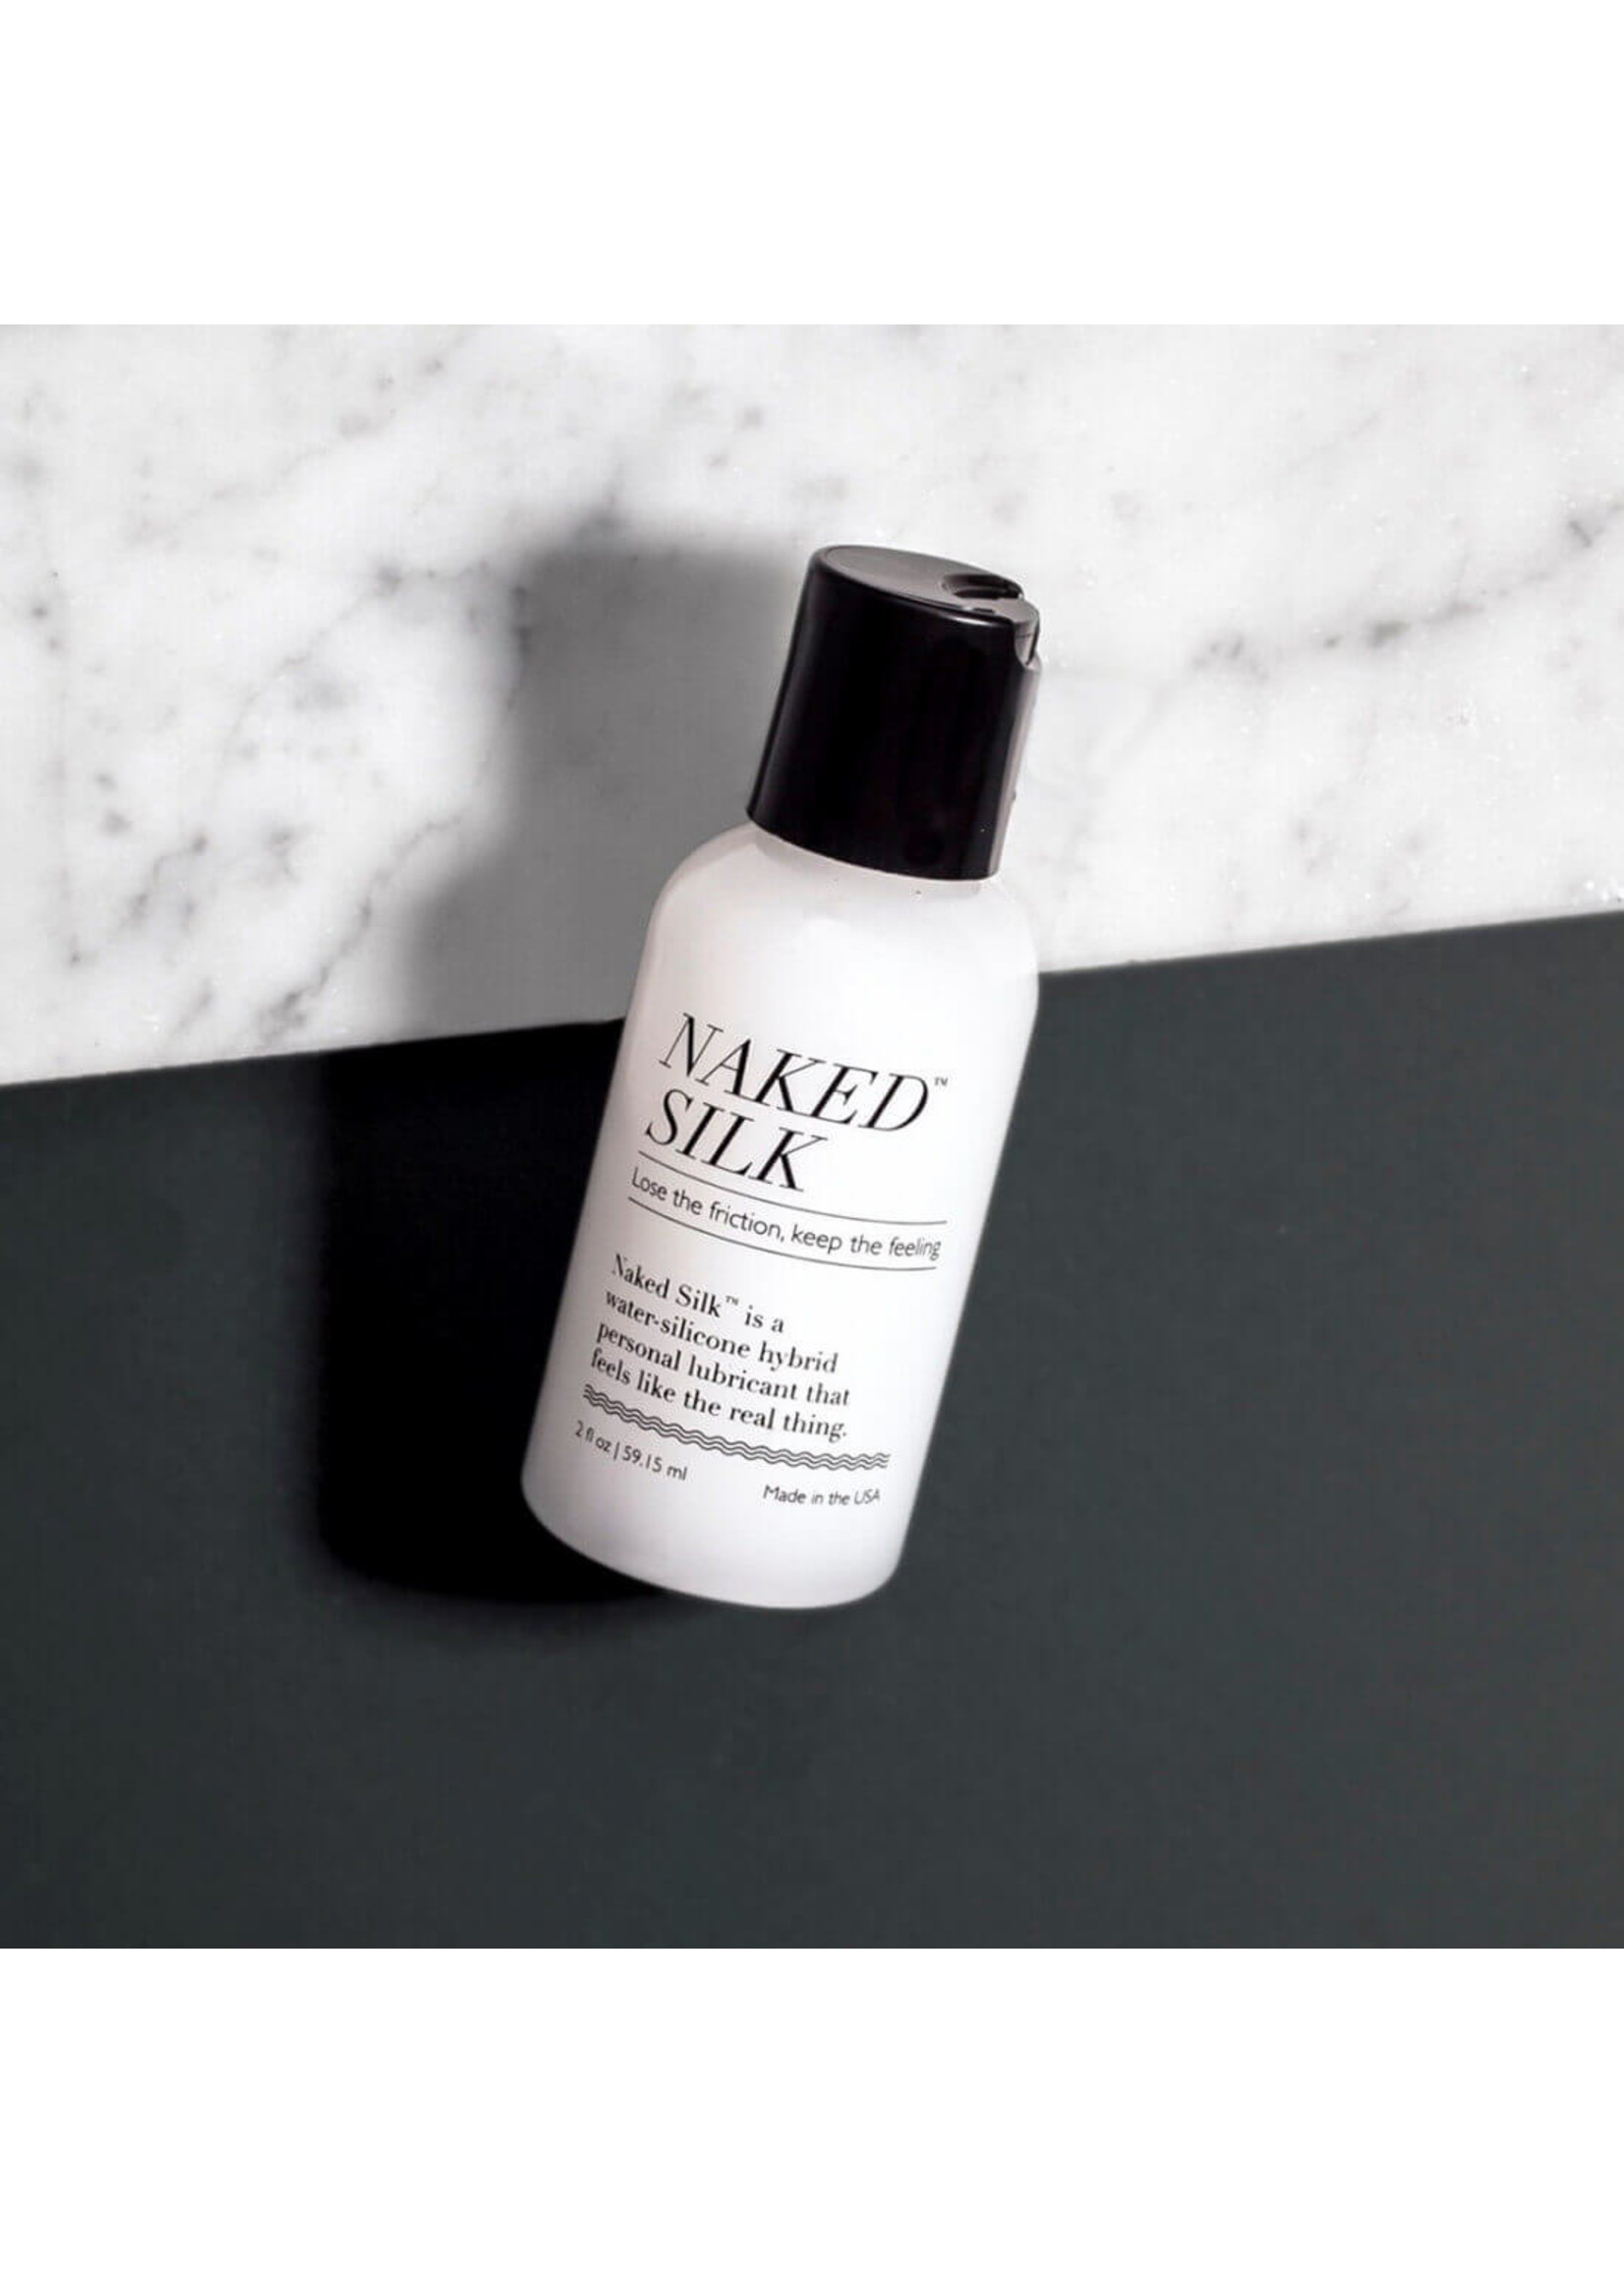 Naked Silk 2 oz.